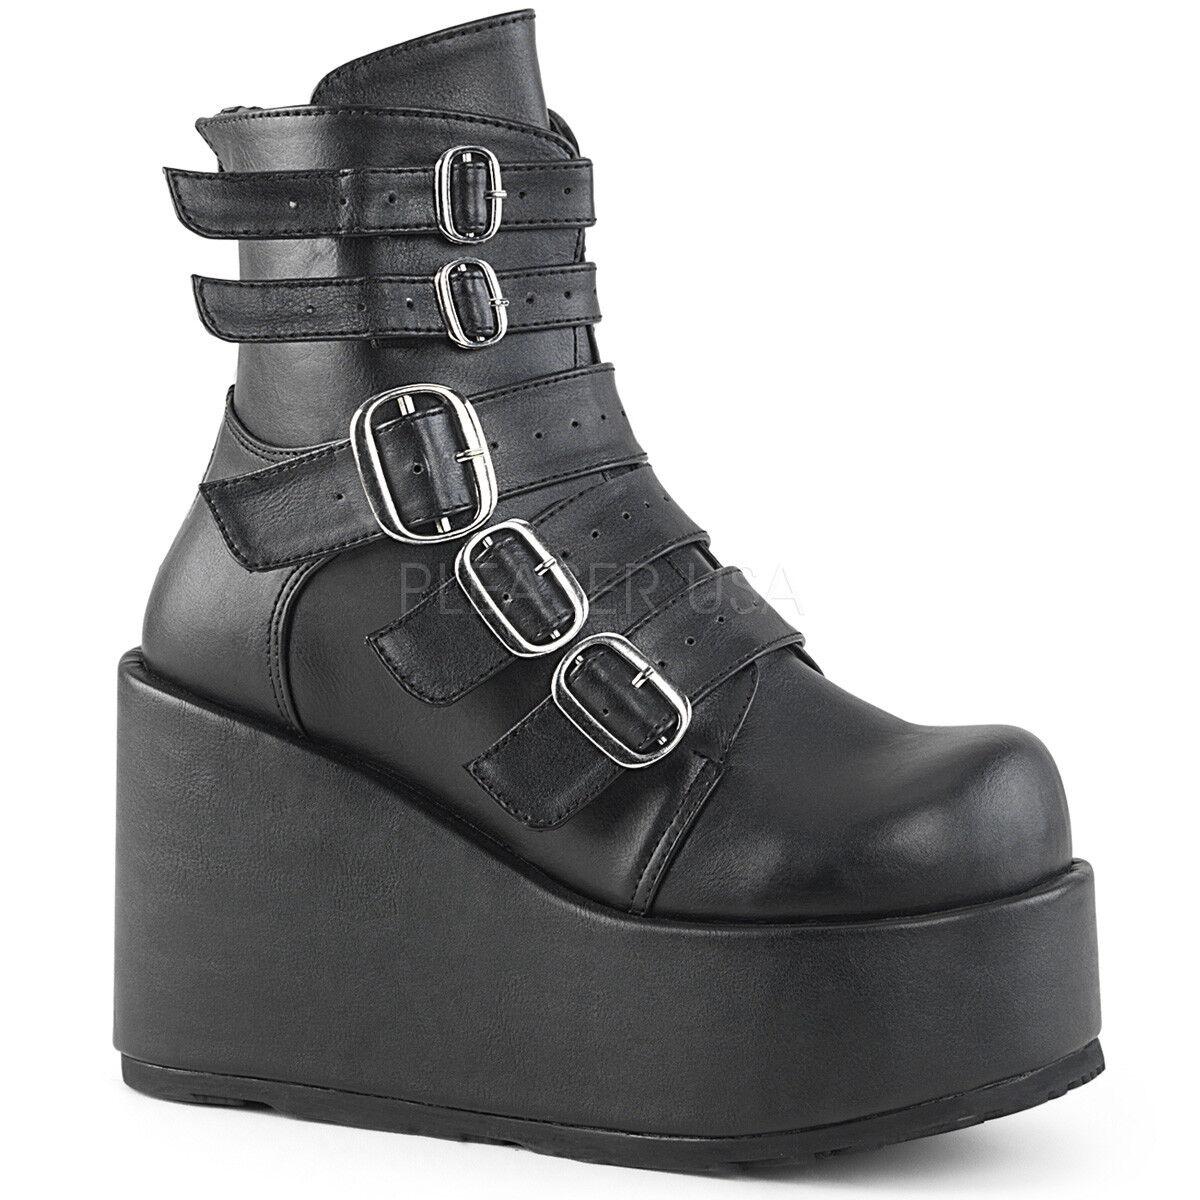 DEMONIA CON57/BVL Women's Goth Lolita Buckle Black Buckle Lolita Straps Platform Ankle Boots f78148